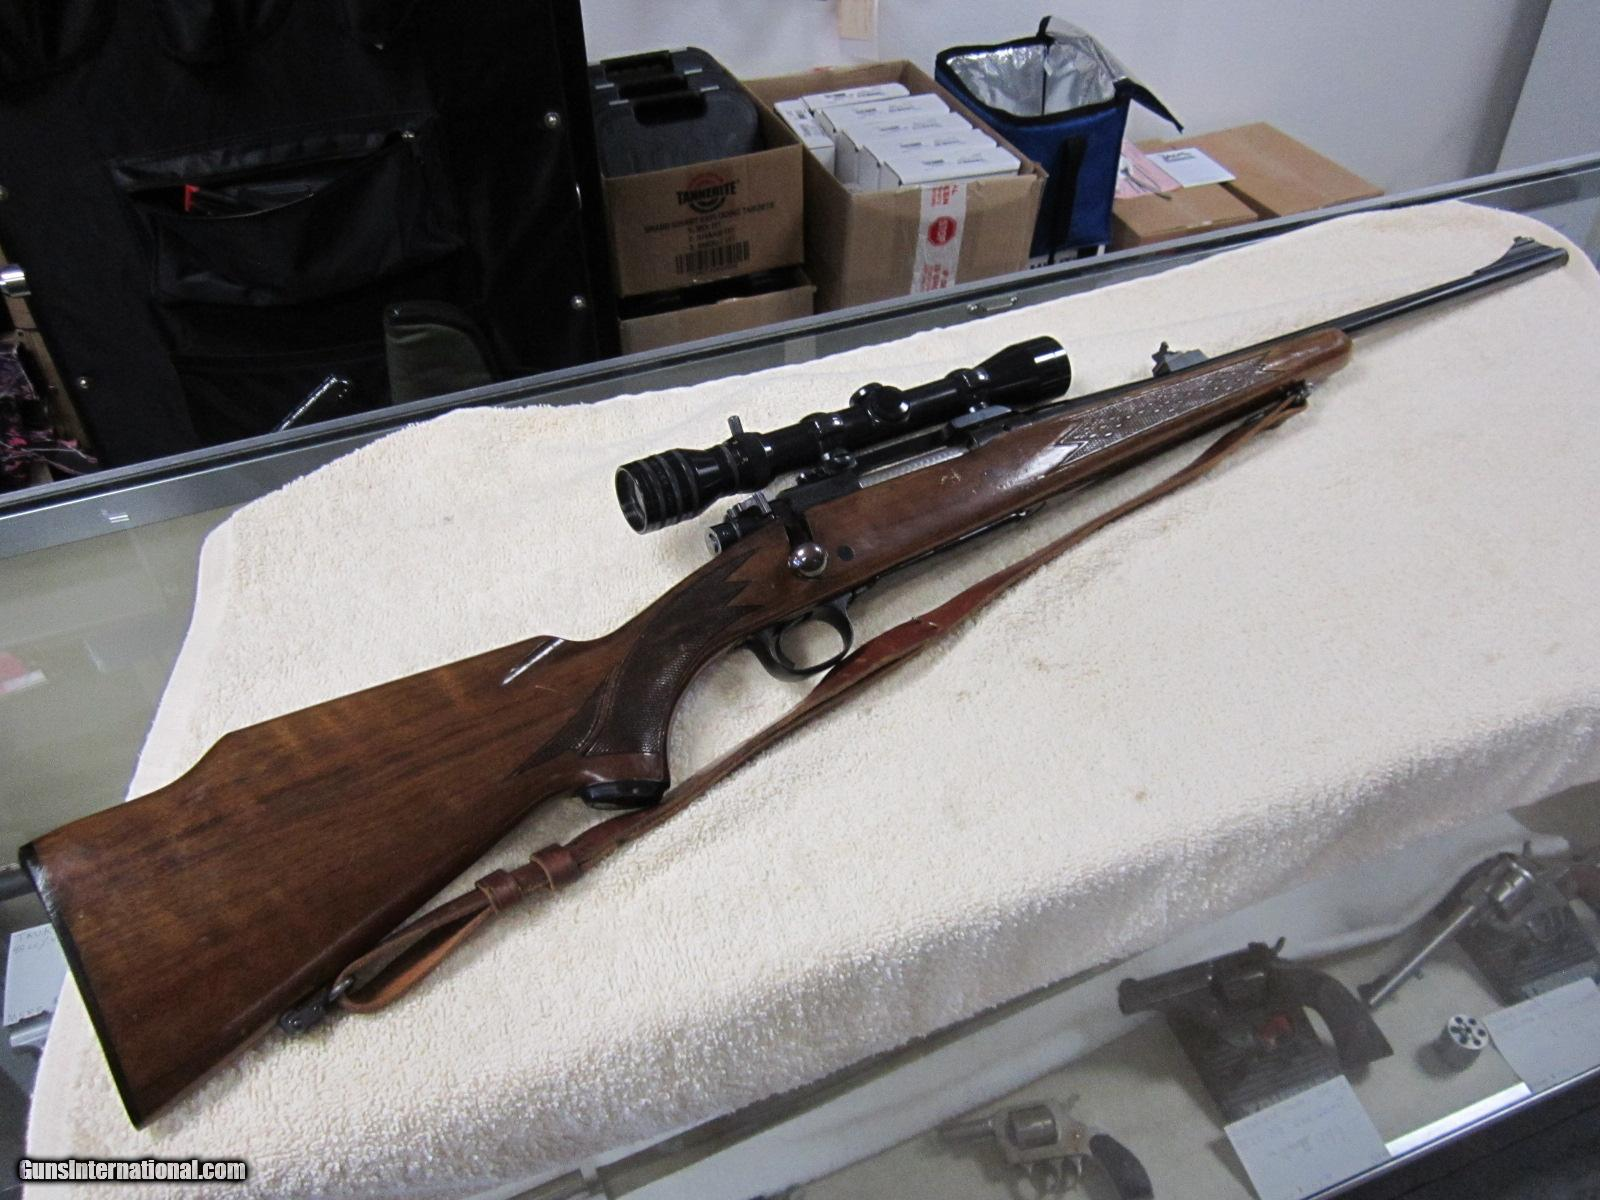 1965 Winchester Model 70 Monte Carlo Walnut stock hinged floorplate